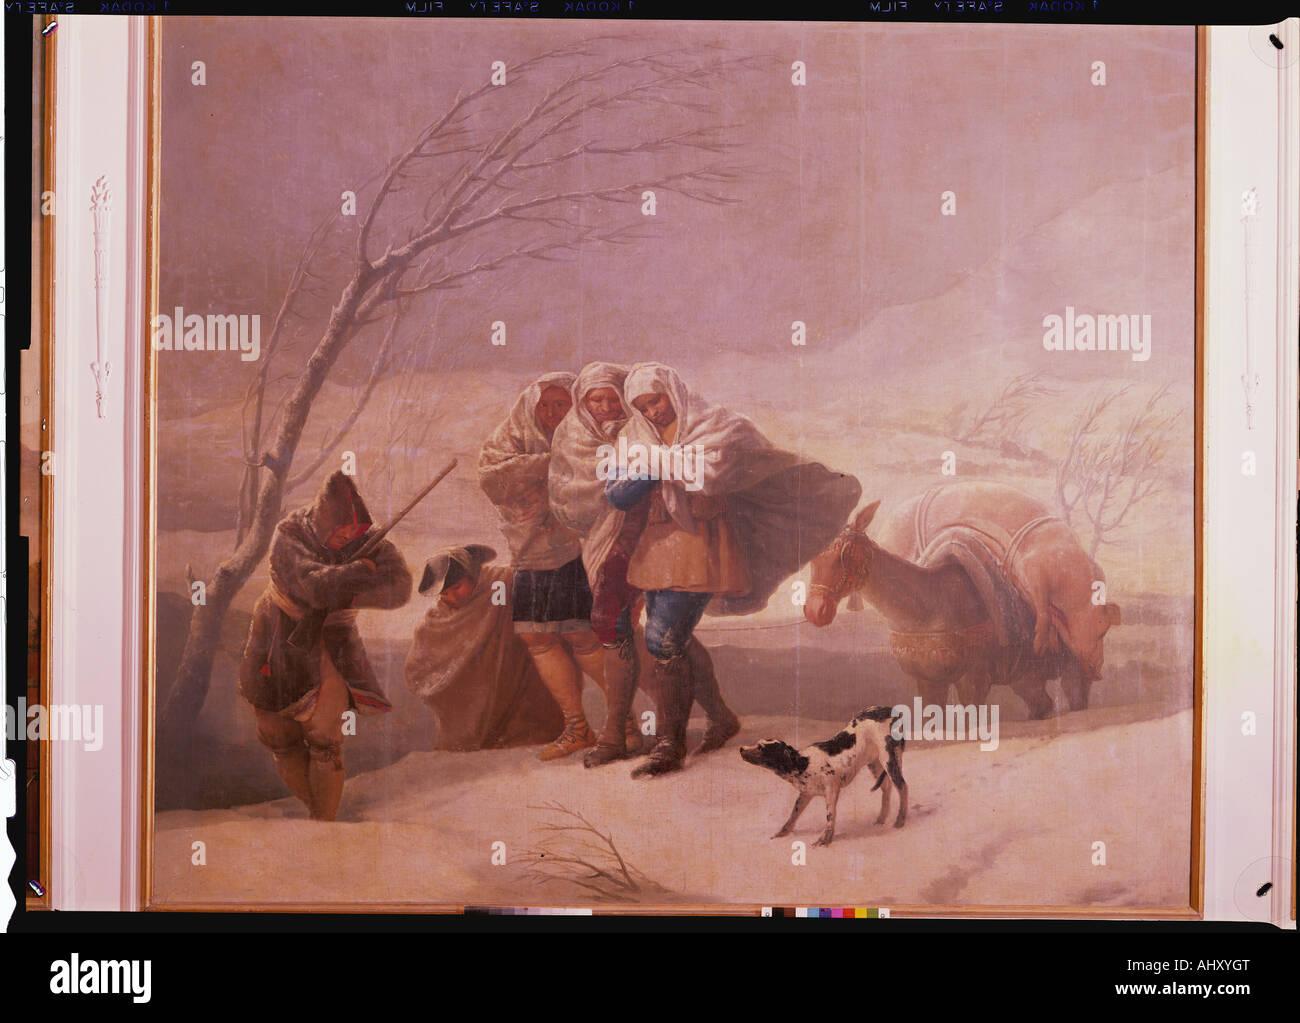 Donkey And Pig Stock Photos & Donkey And Pig Stock Images - Alamy